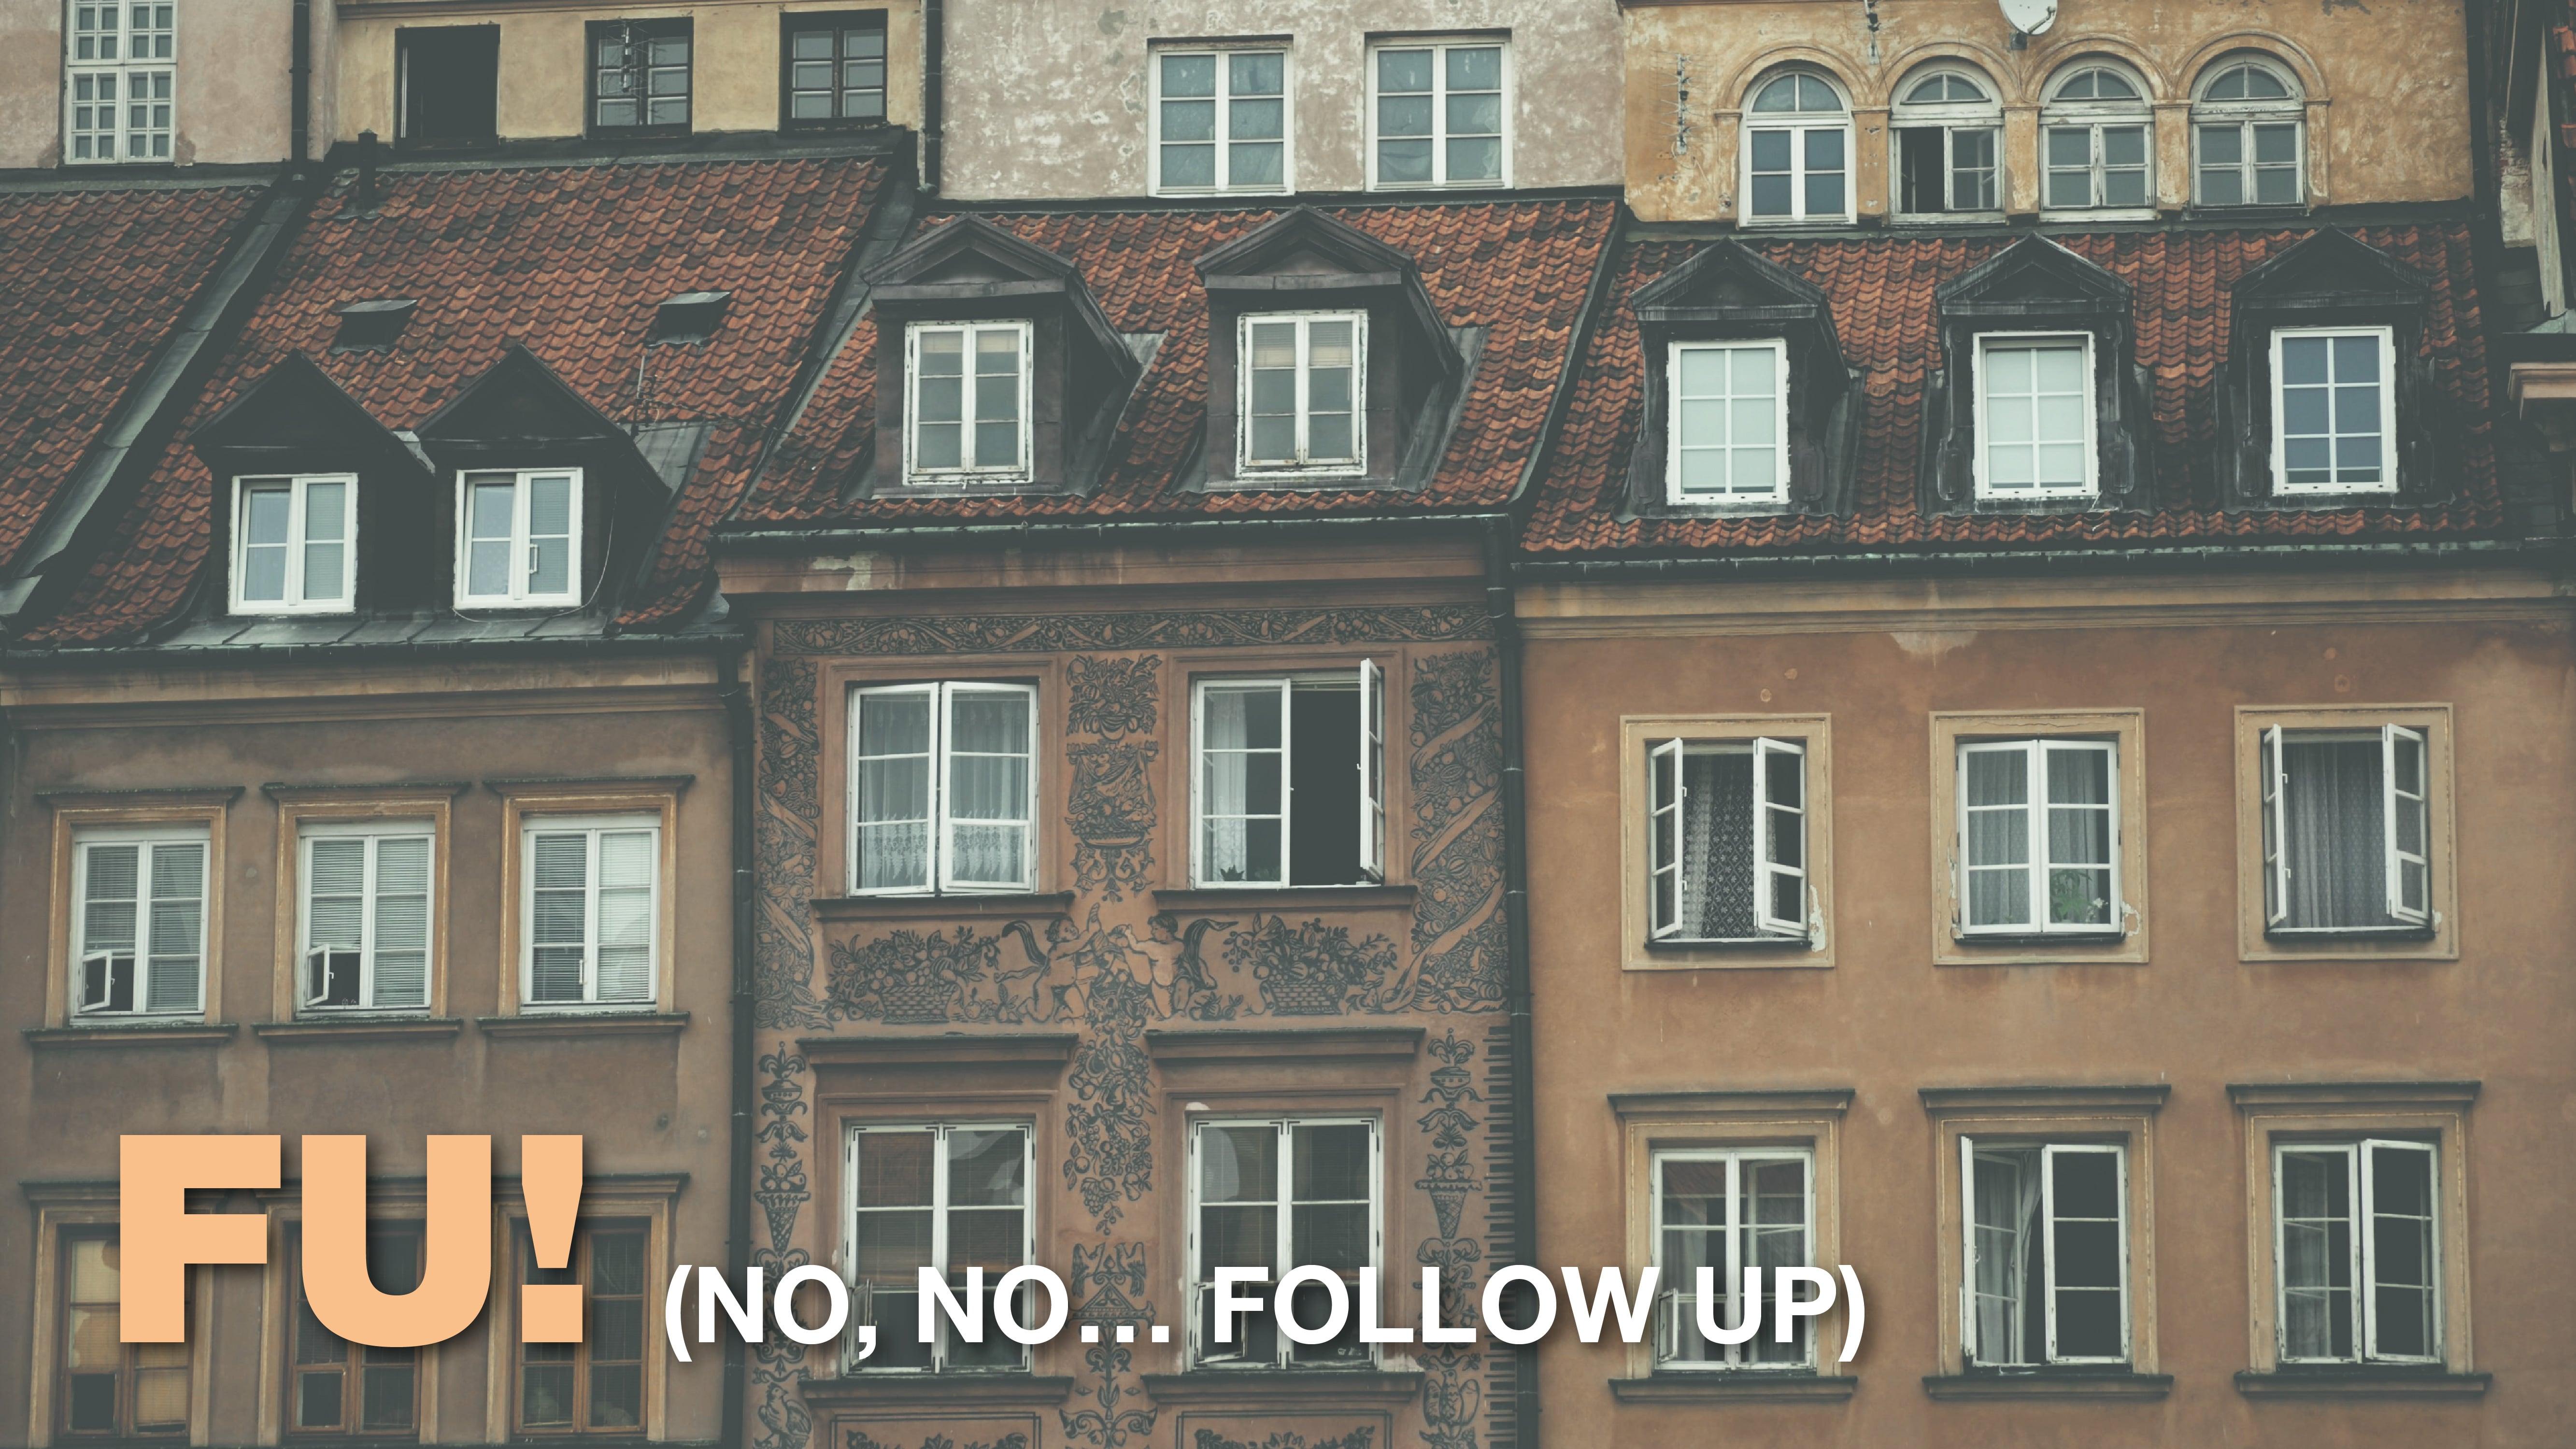 FU! (No, no… follow up)